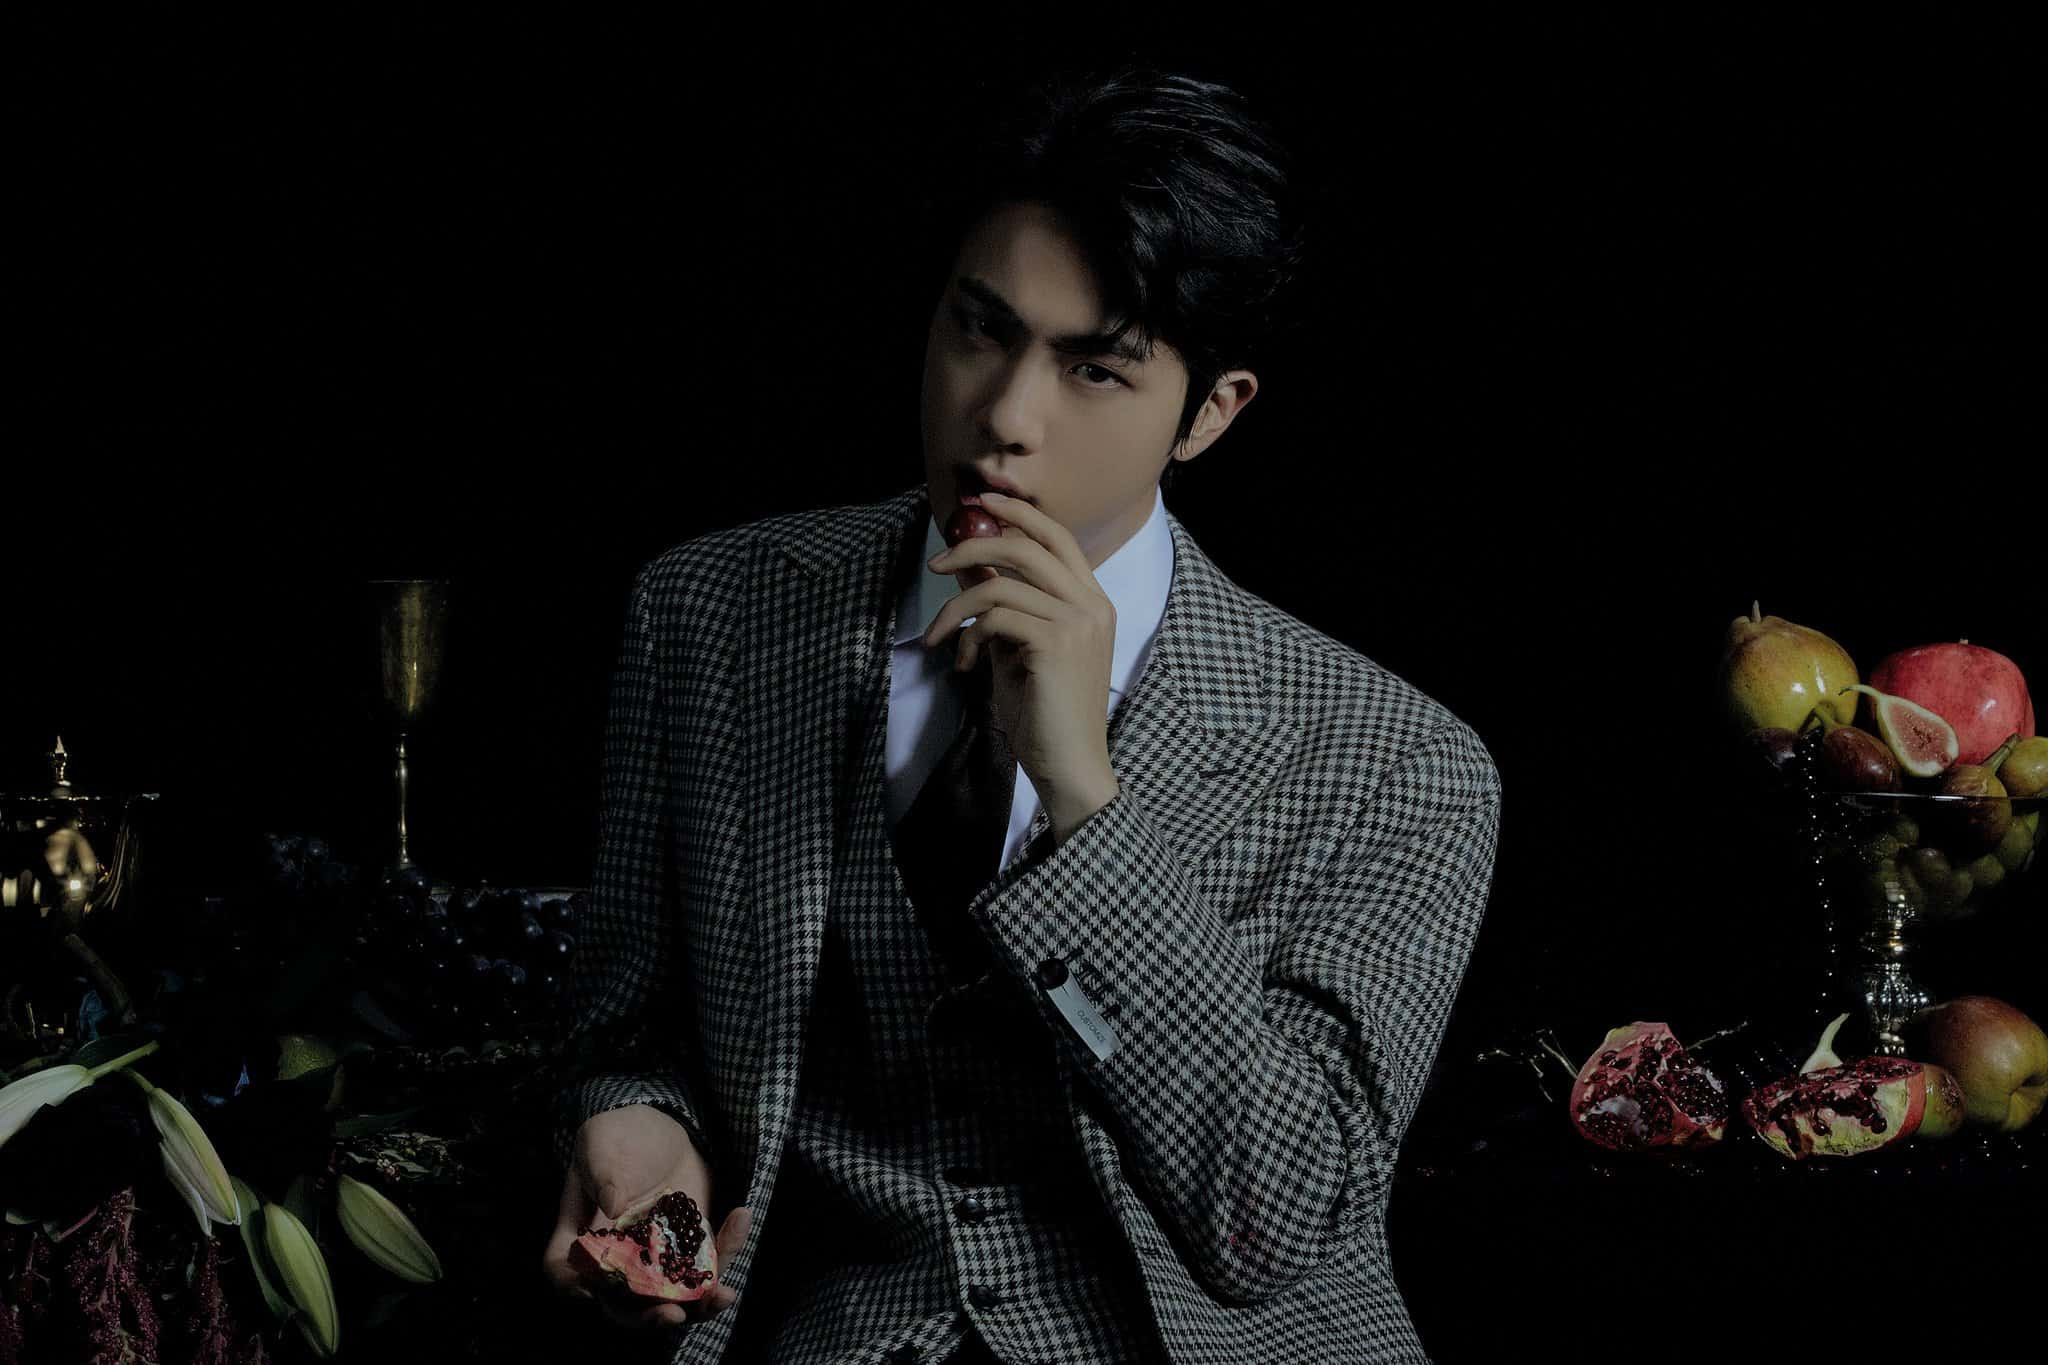 bts member kim seok jin